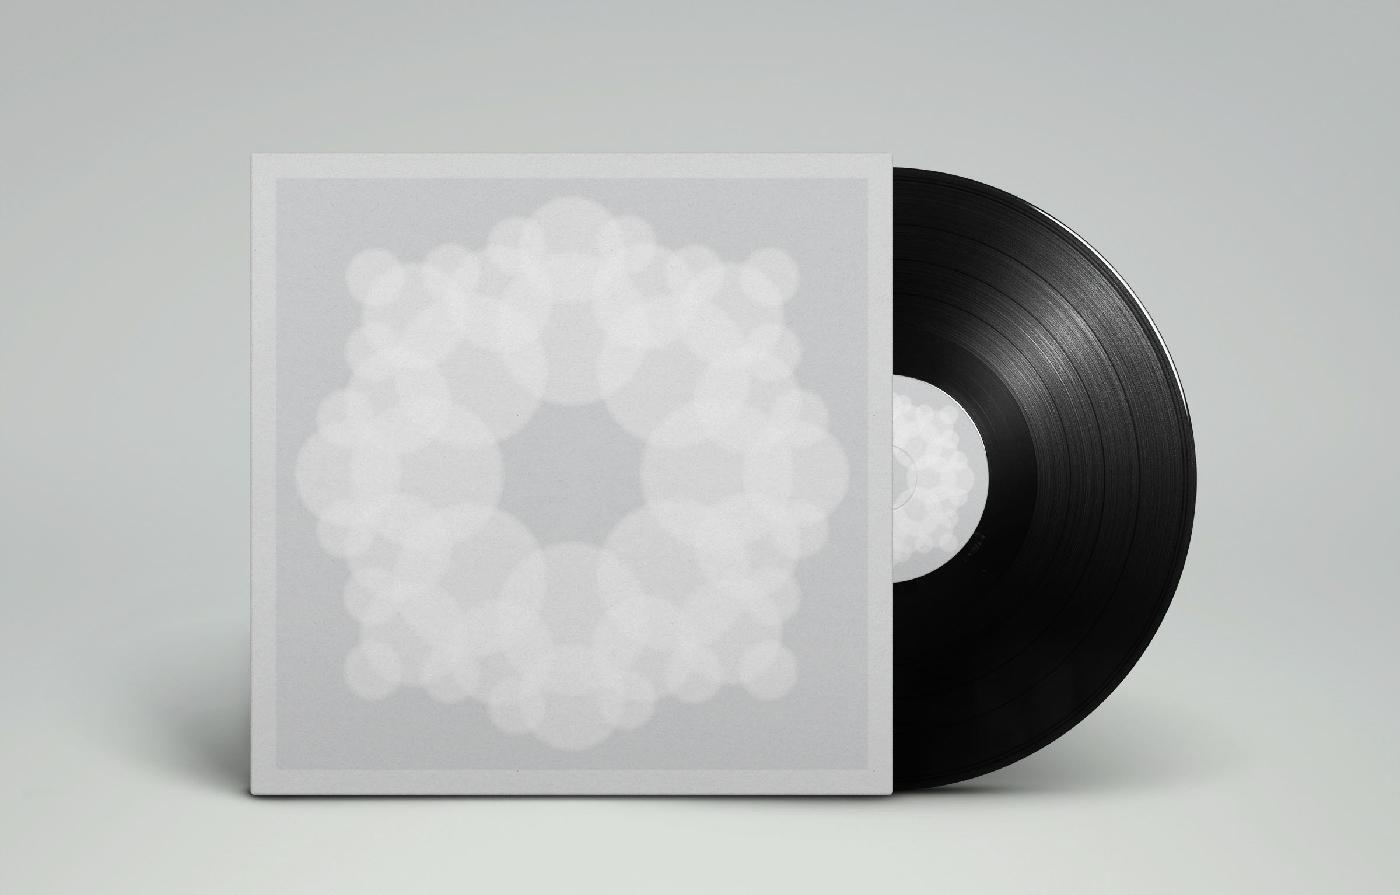 Max Richter - Dream 3 - sleeve 1